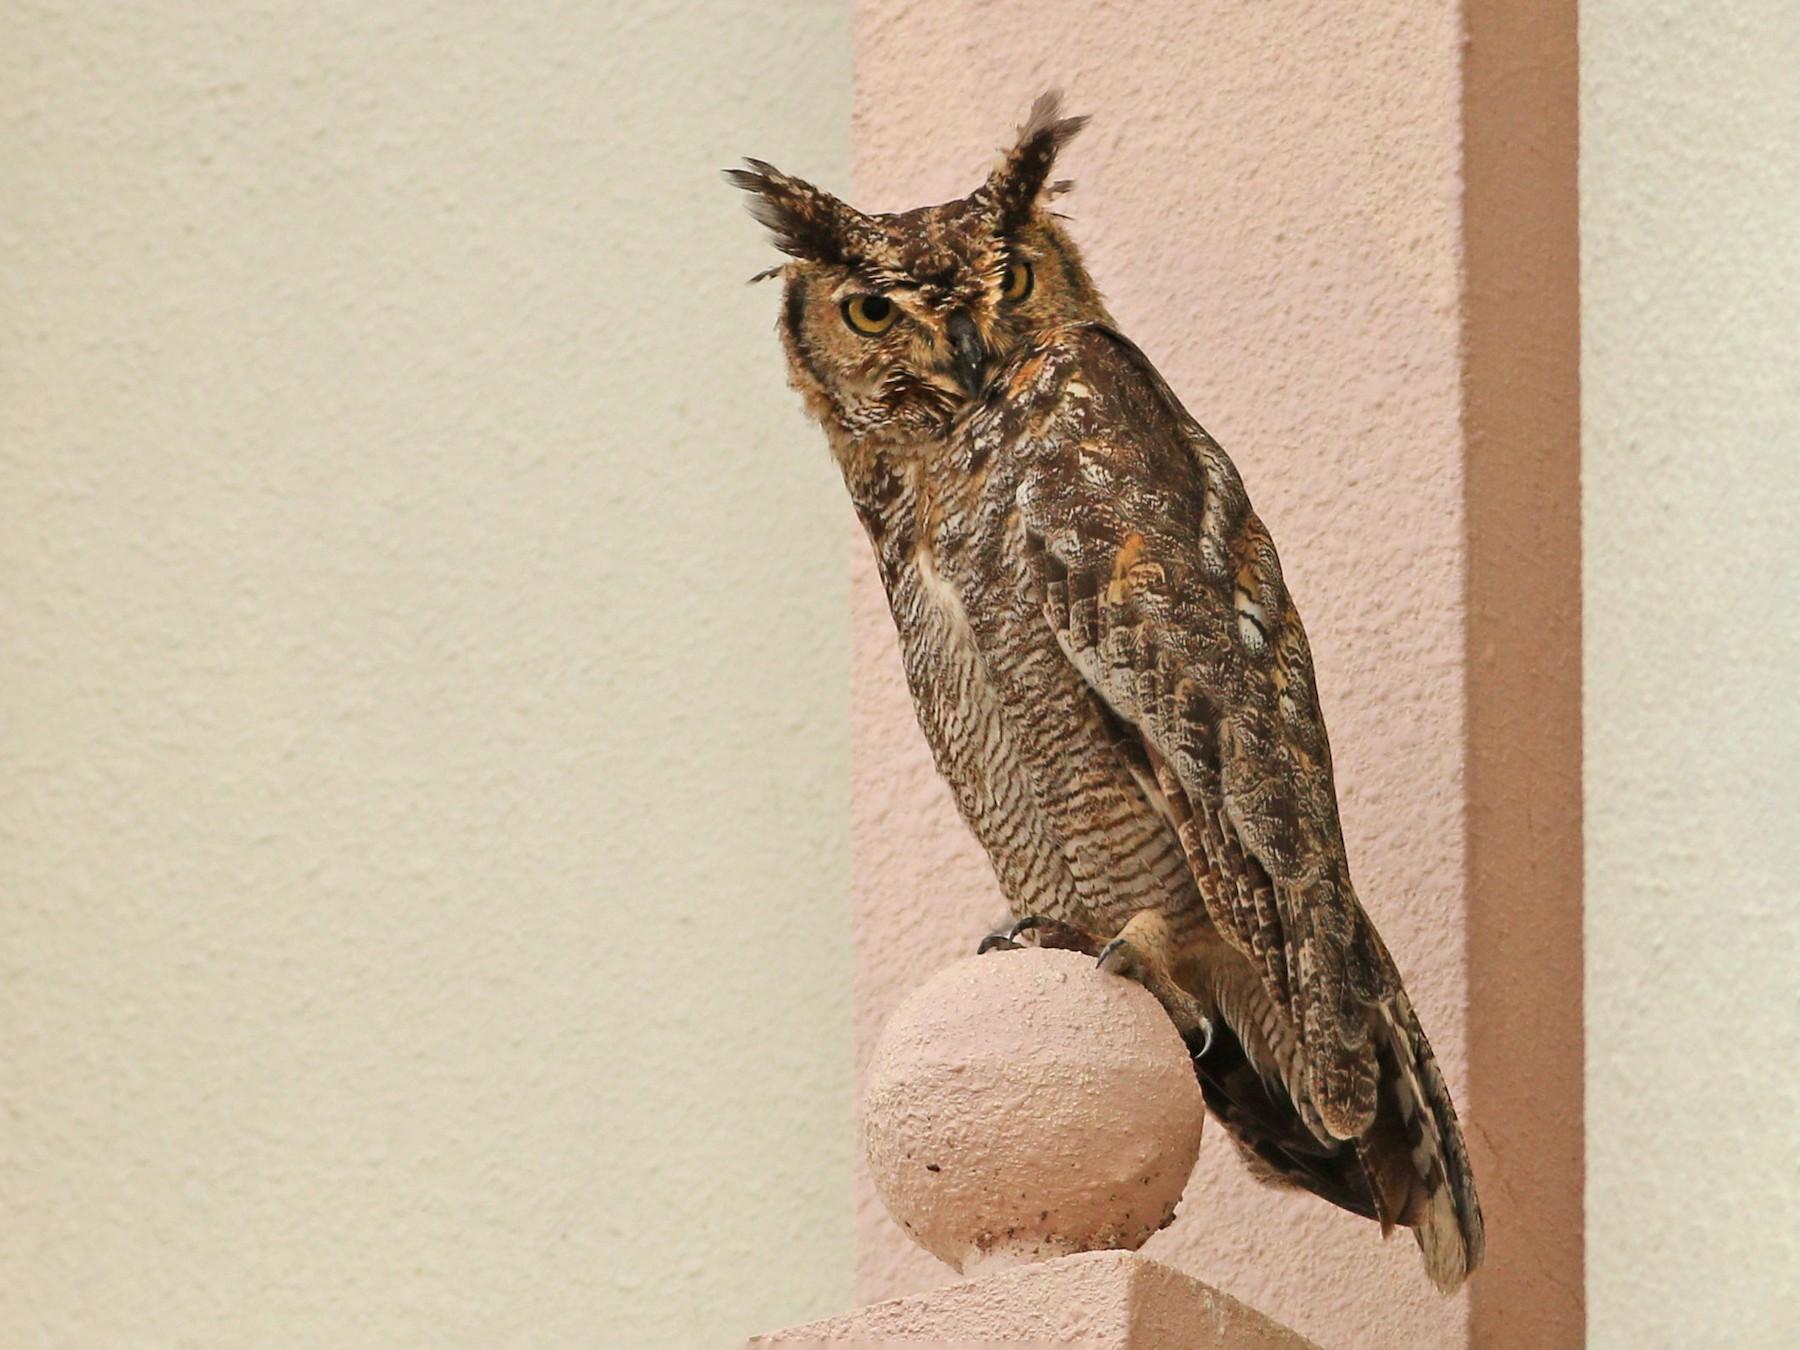 Arabian Eagle-Owl - Khalifa Al Dhaheri